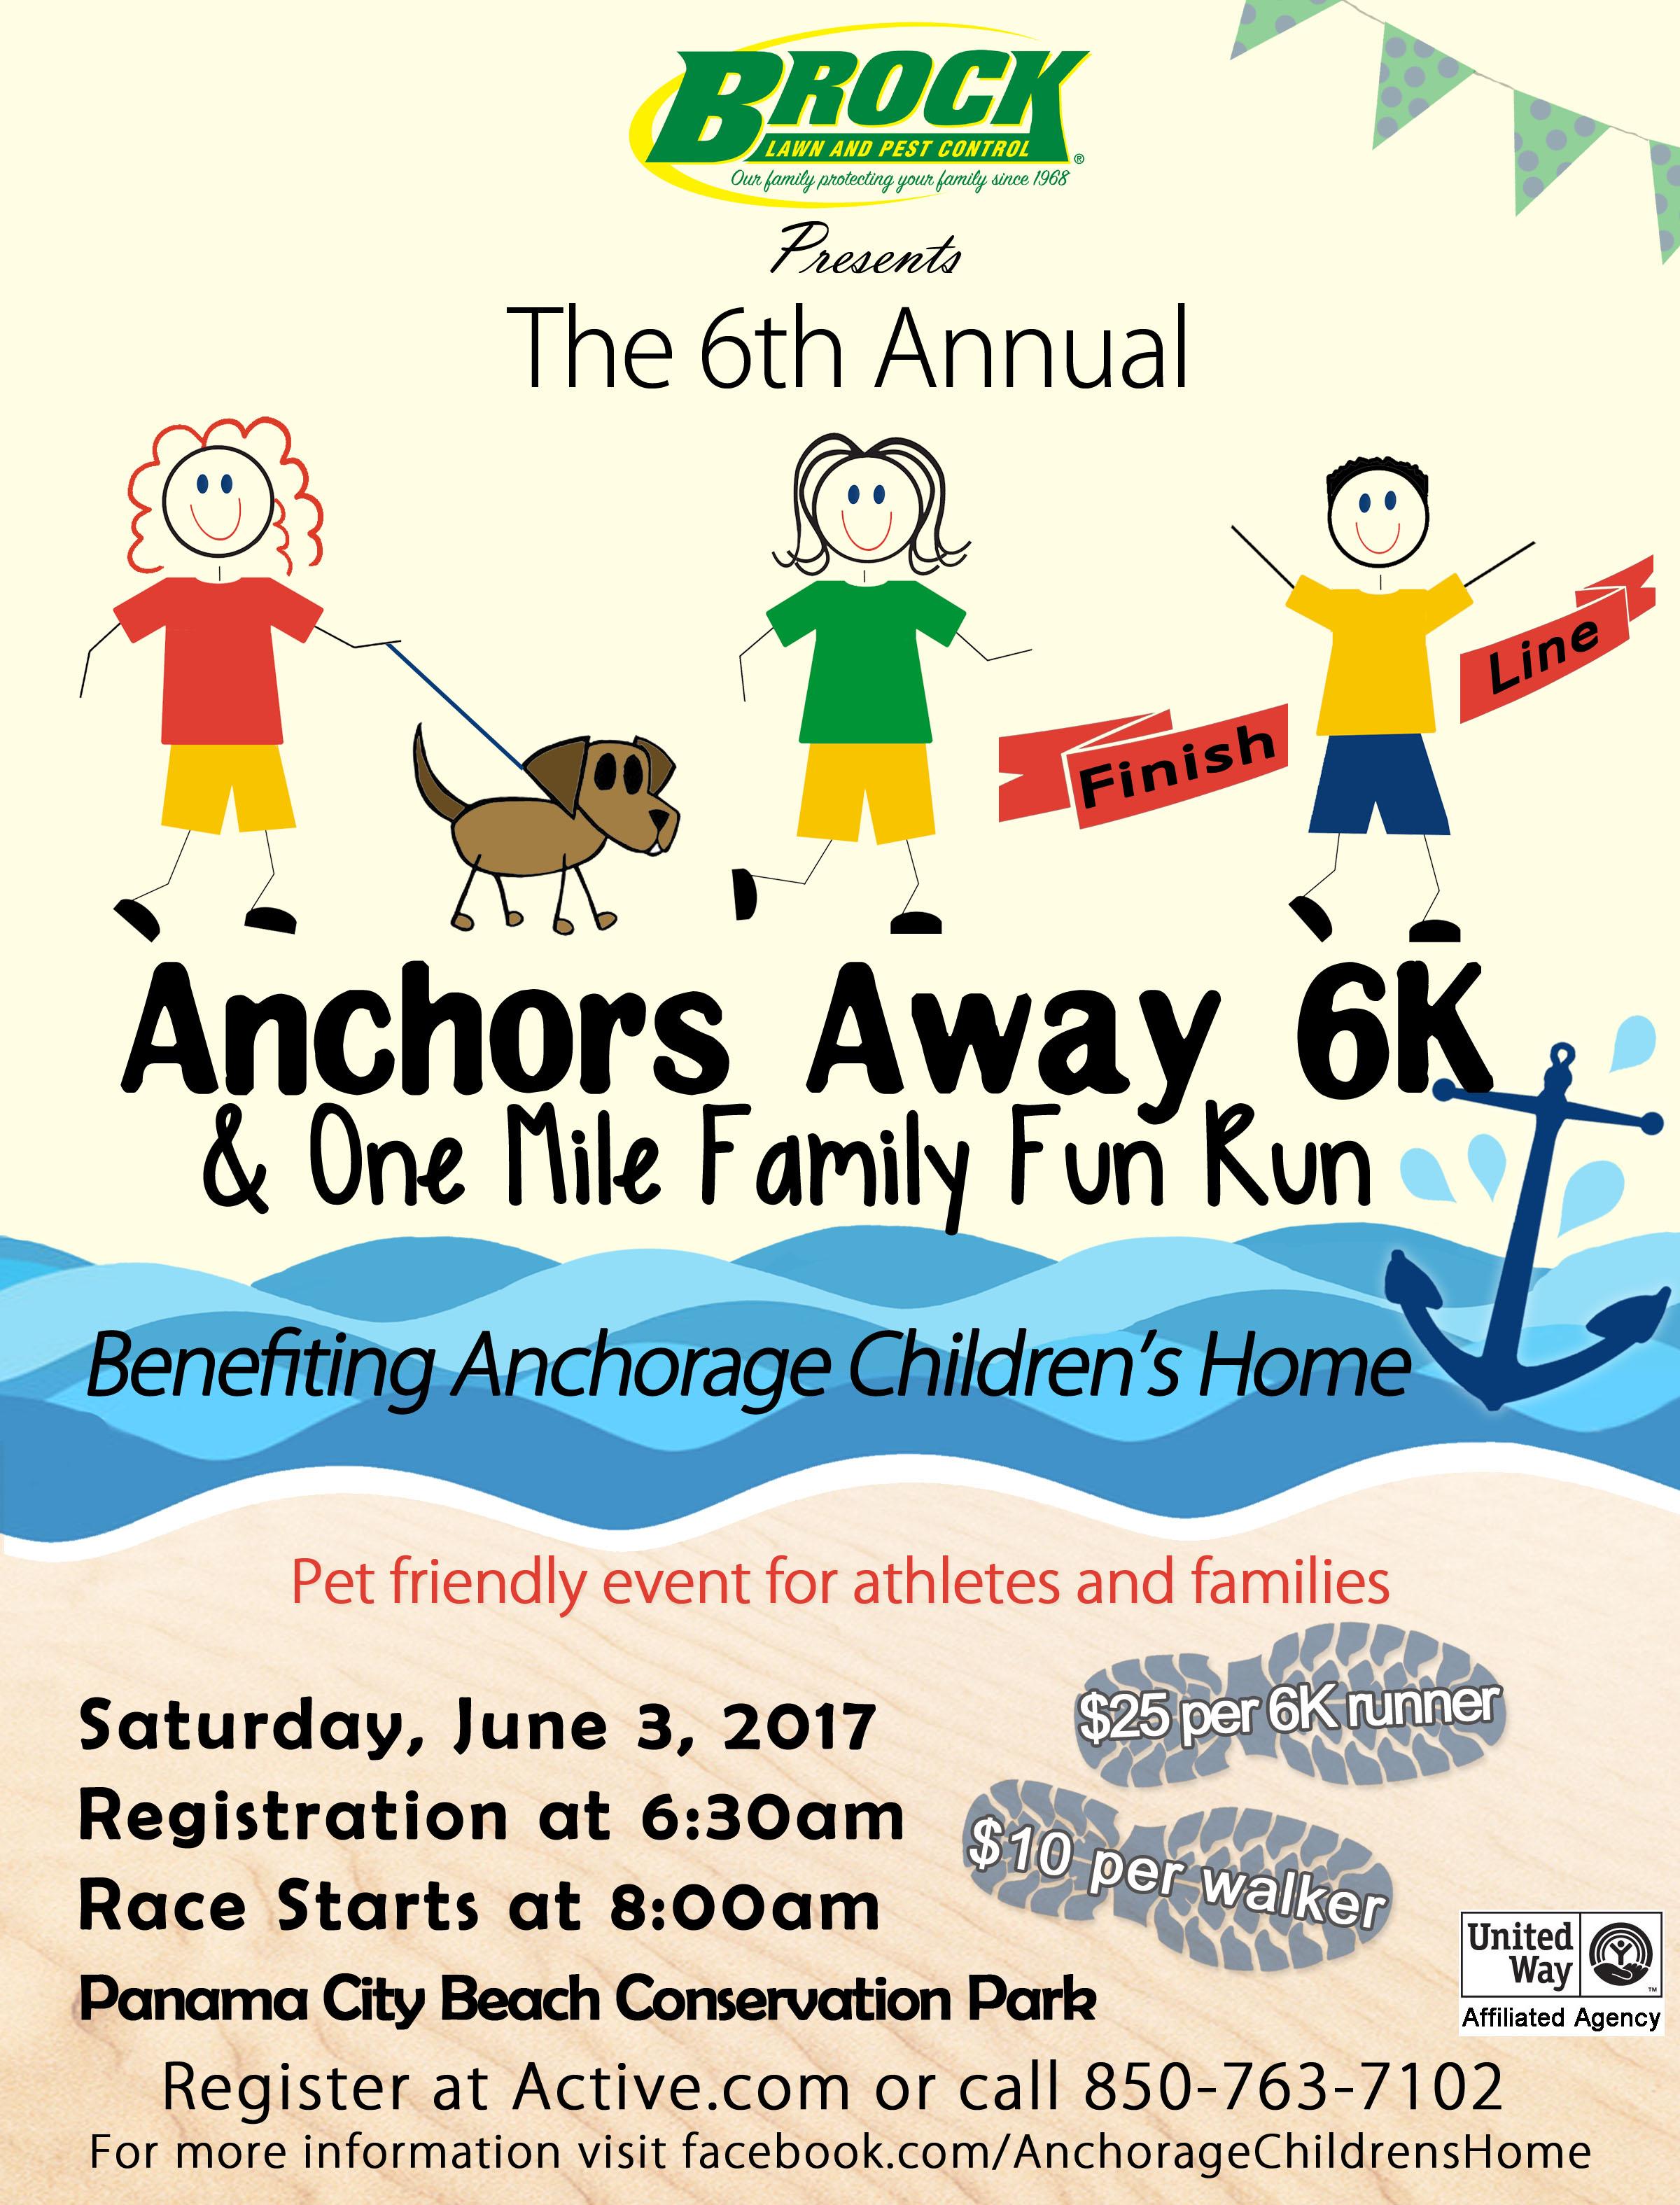 Anchors Away 6k